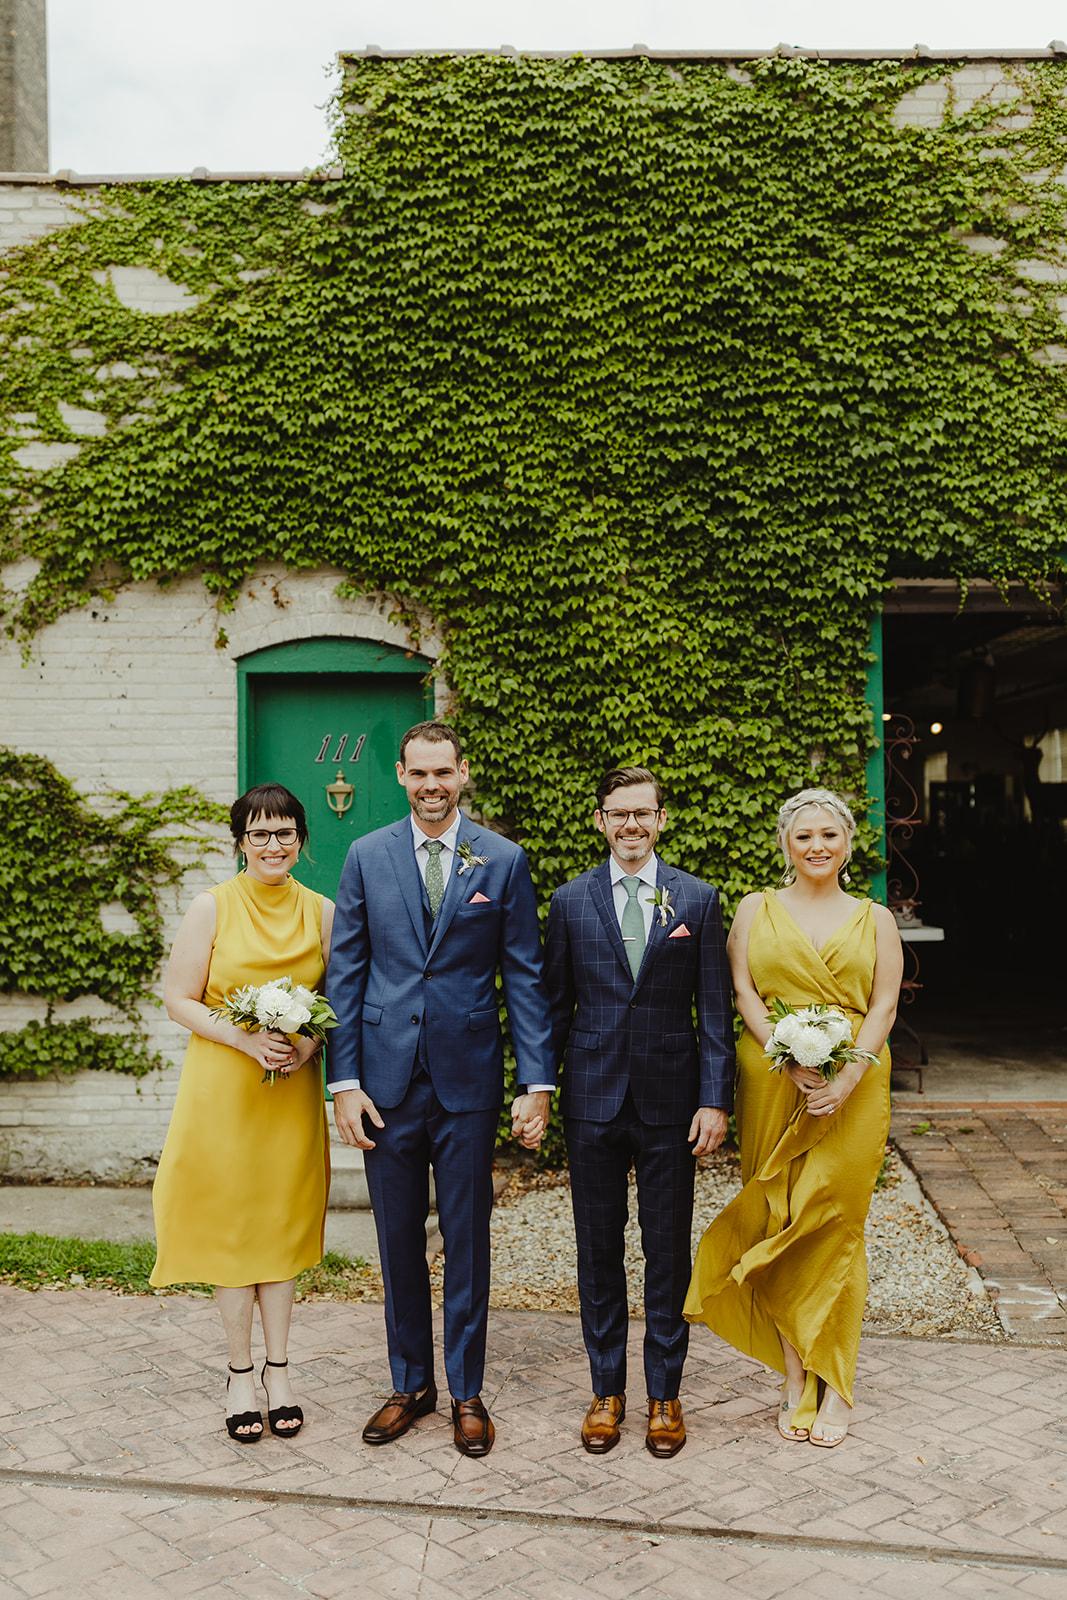 Grooms & bridesmaids smiling